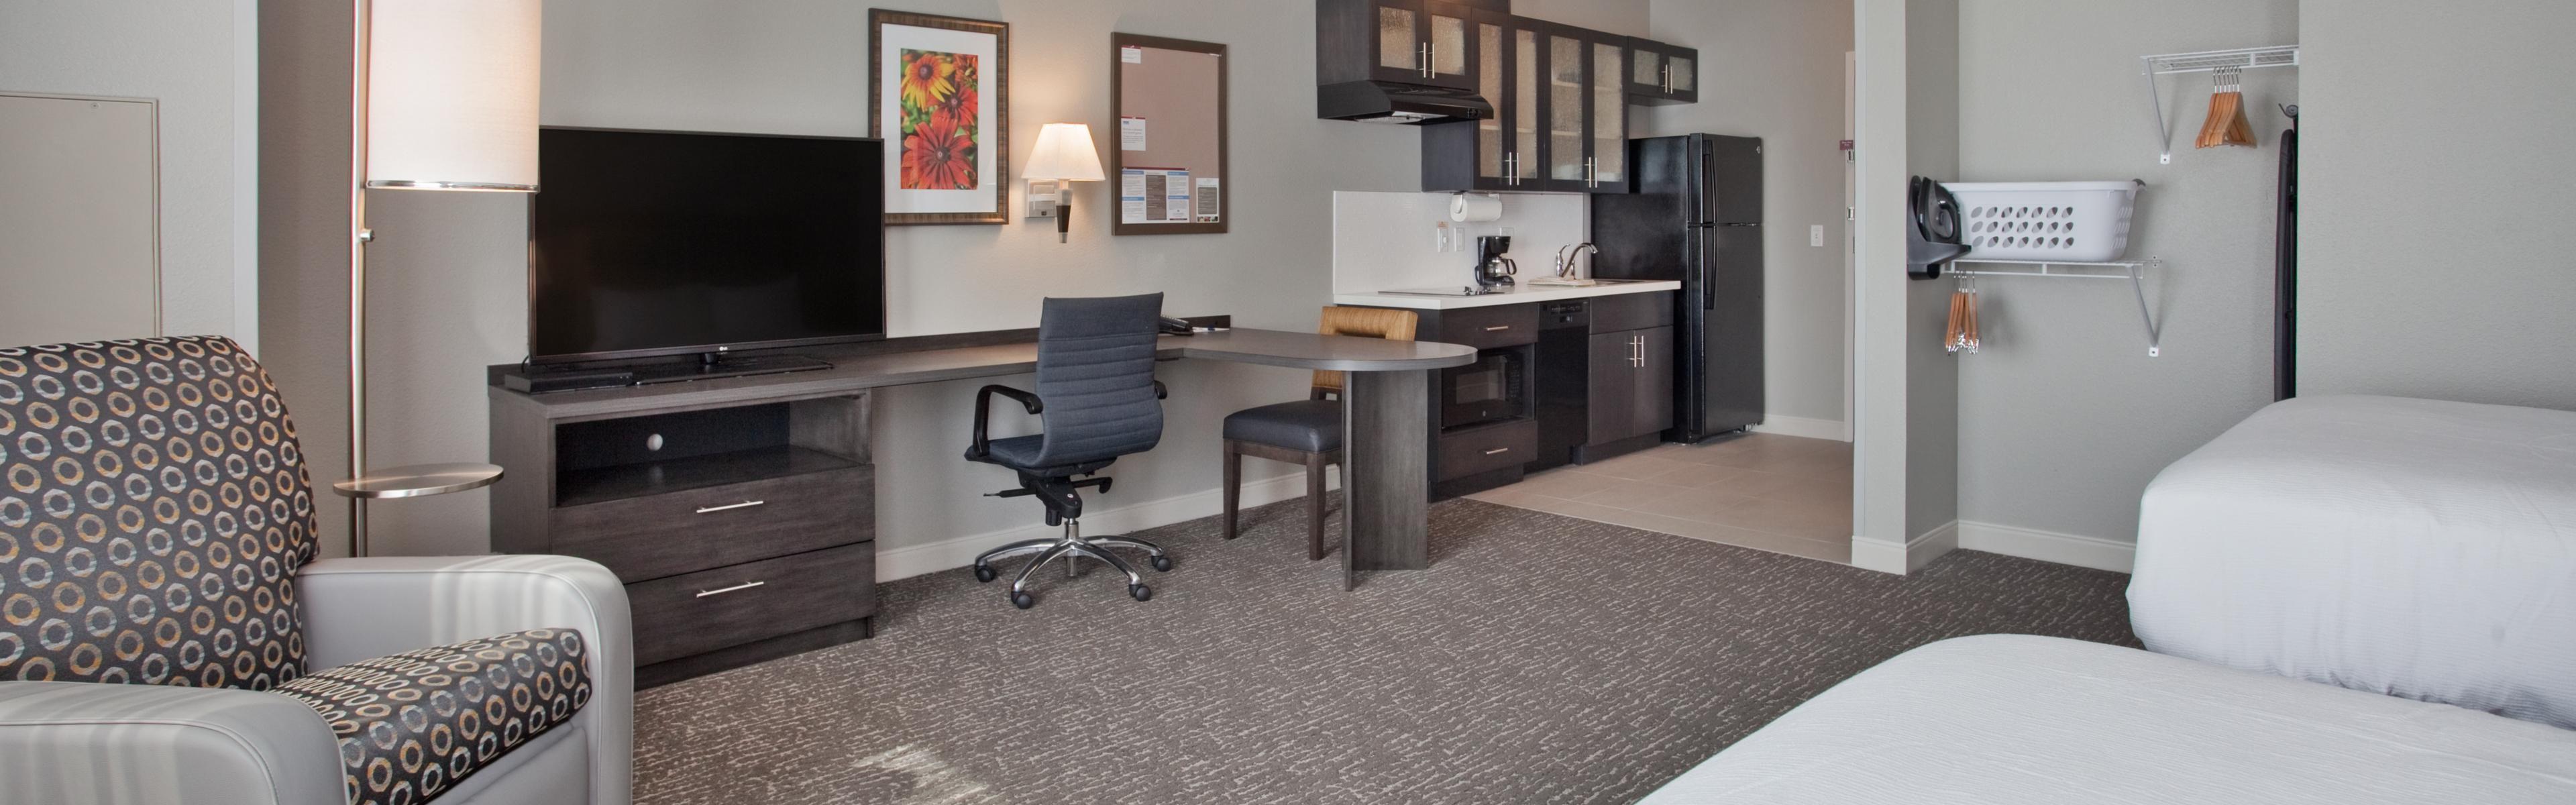 Candlewood Suites Kearney image 1